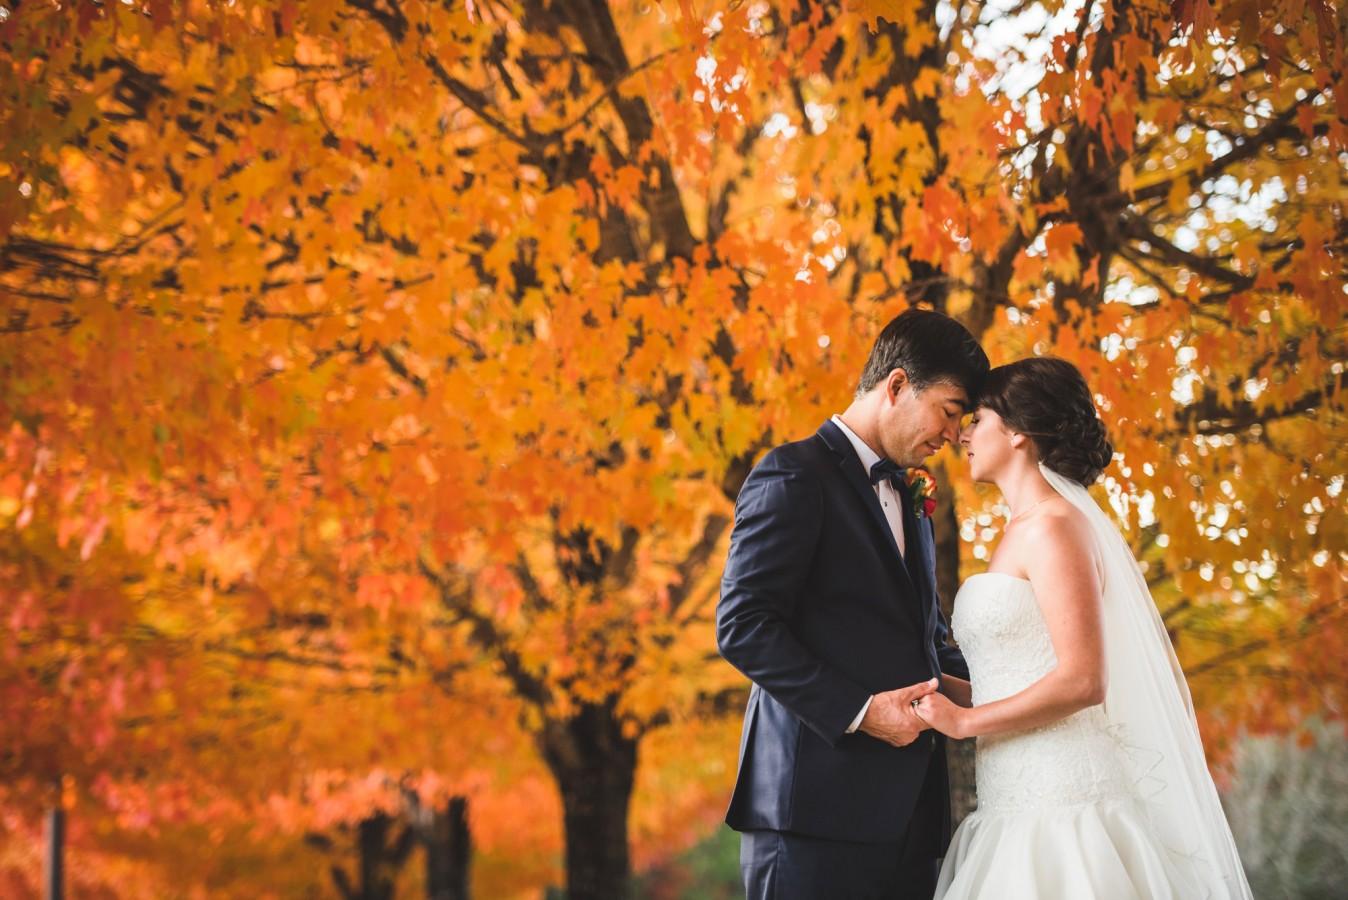 fete-photography-weddings-024